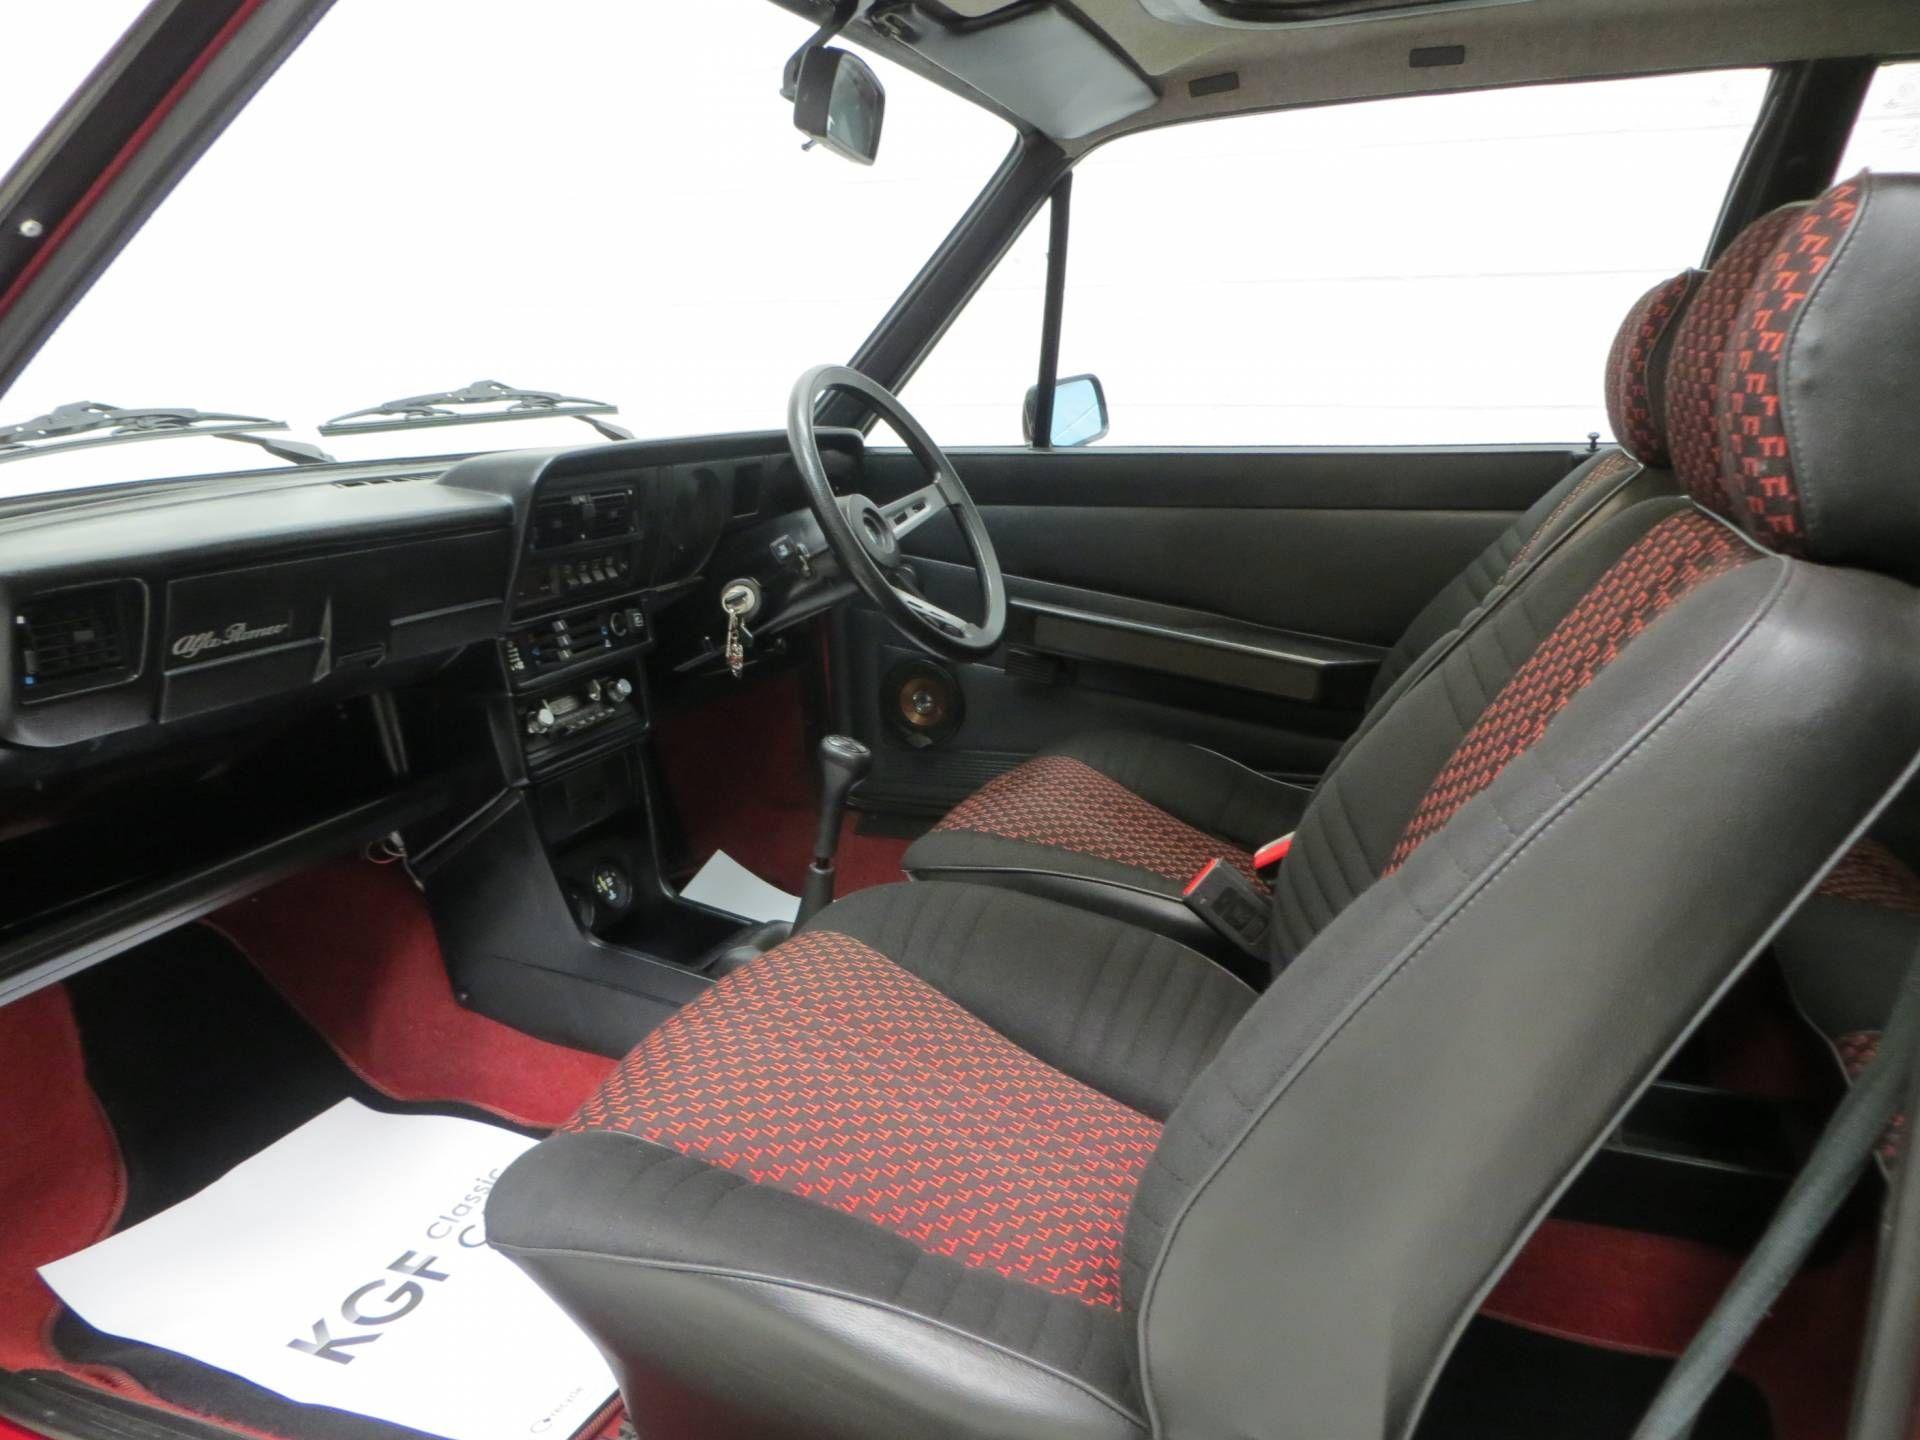 1983 Alfa Romeo Alfasud TI 1.3 | F4, 1,351 cm³ | 86 hp | design ...